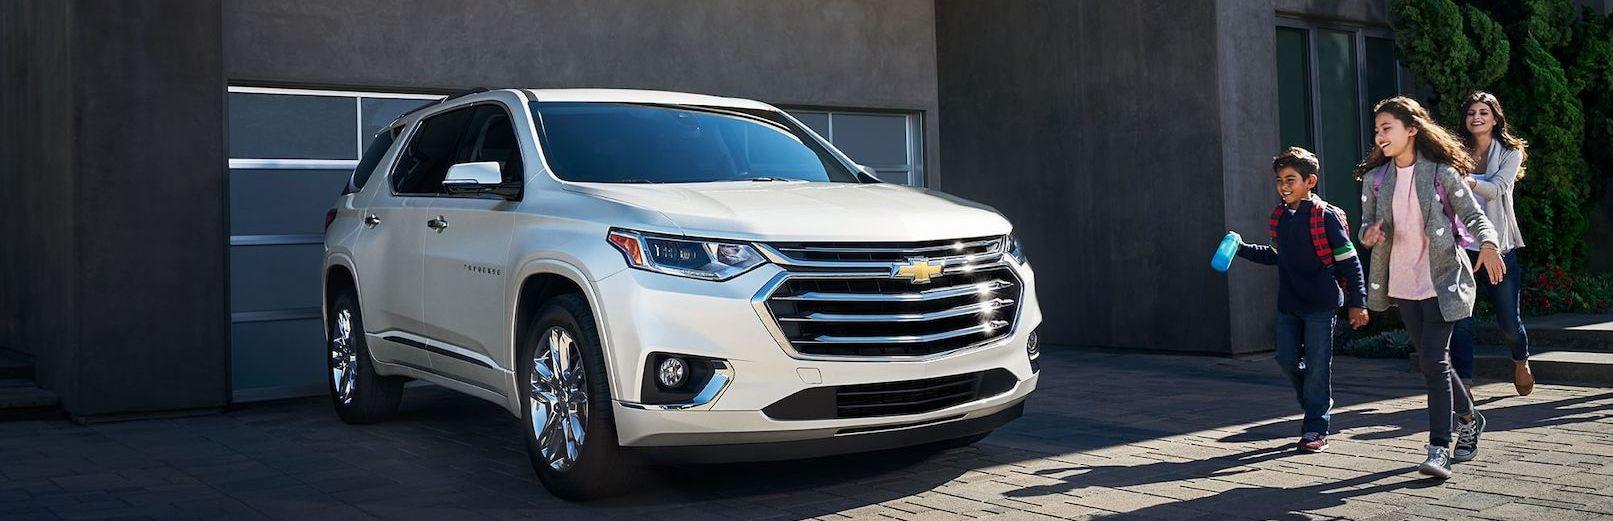 2019 Chevrolet Traverse for Sale near Grand Blanc, MI